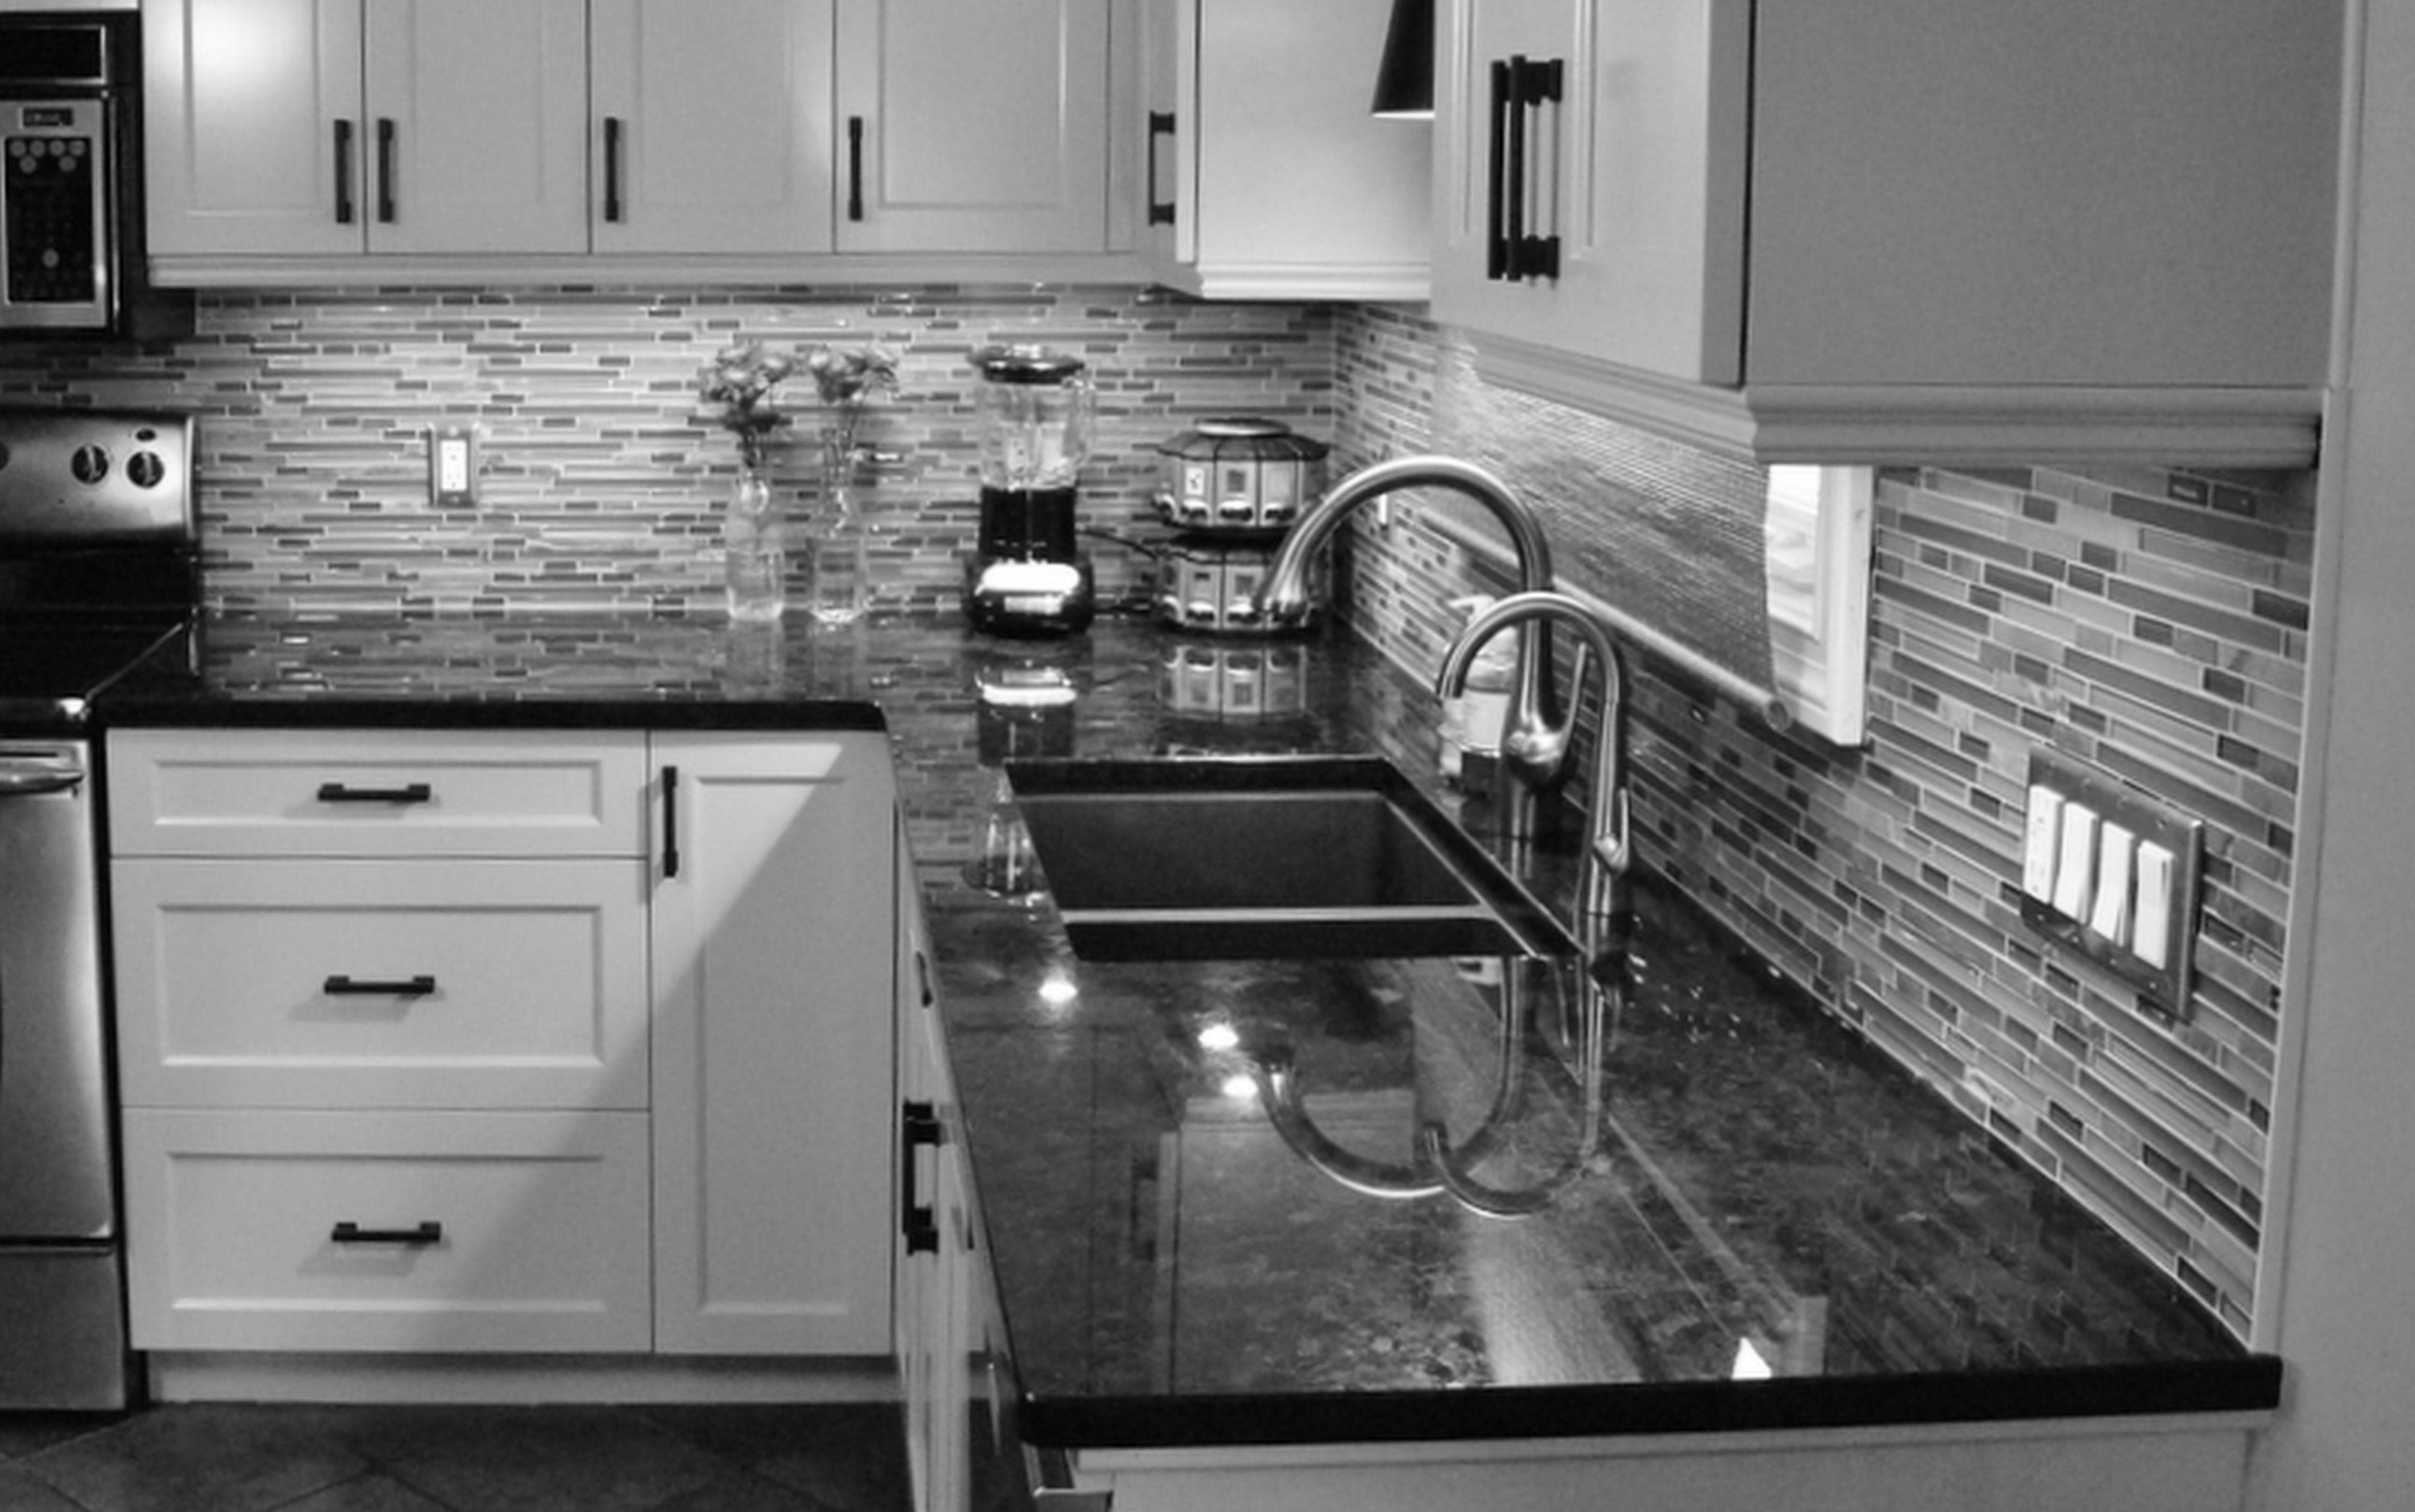 Bathroom Design Inspiring Kitchen With Island And Cambria. White Quartz  Countertop Contemporary Kitchen